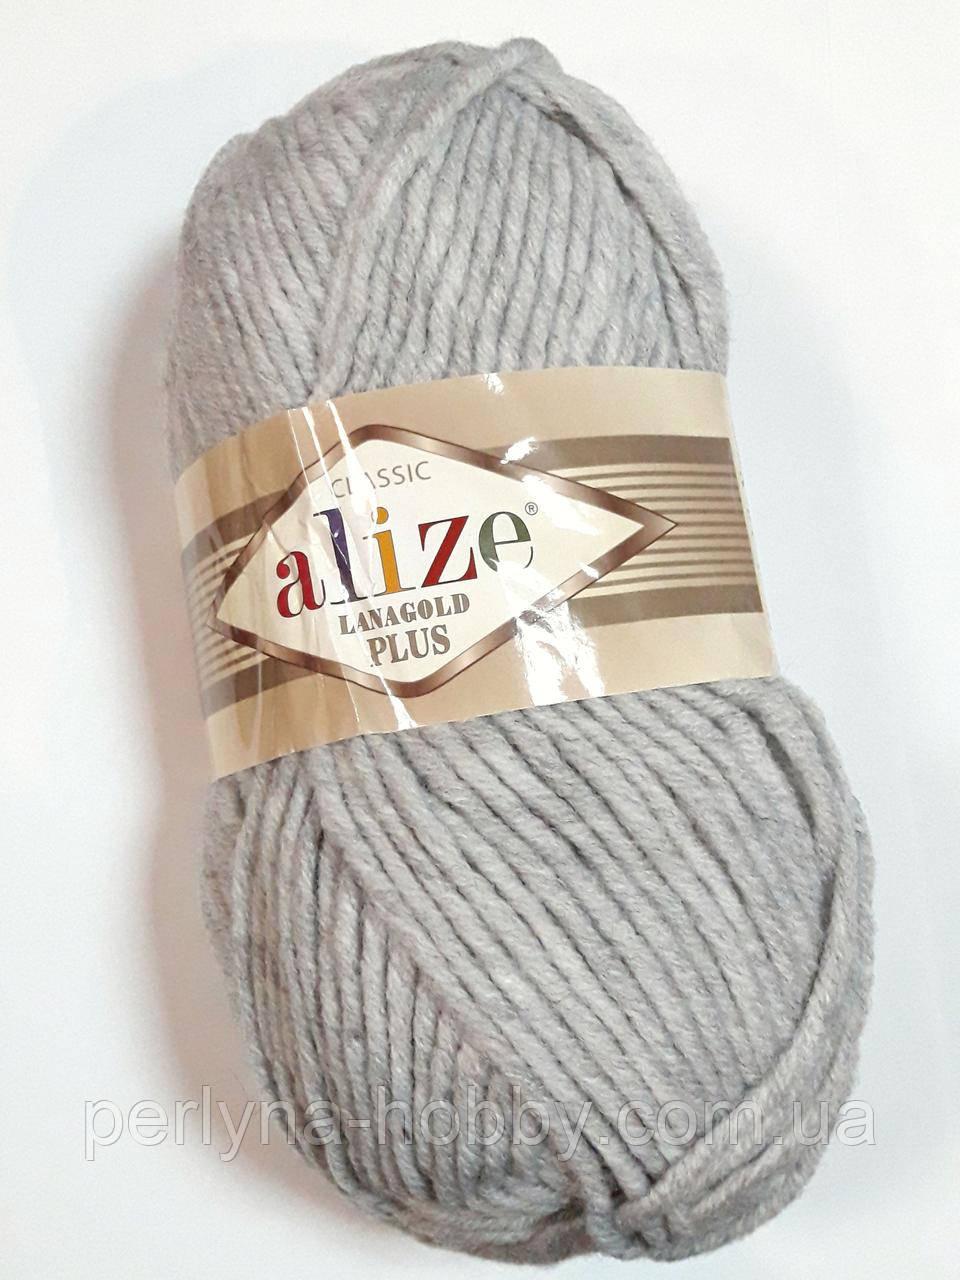 Пряжа Ализе Ланаголд Плюс Alize Lanagold Plus 100 гр, 140 м. 49 % Шерсть, 51 % акрил, сіра світла